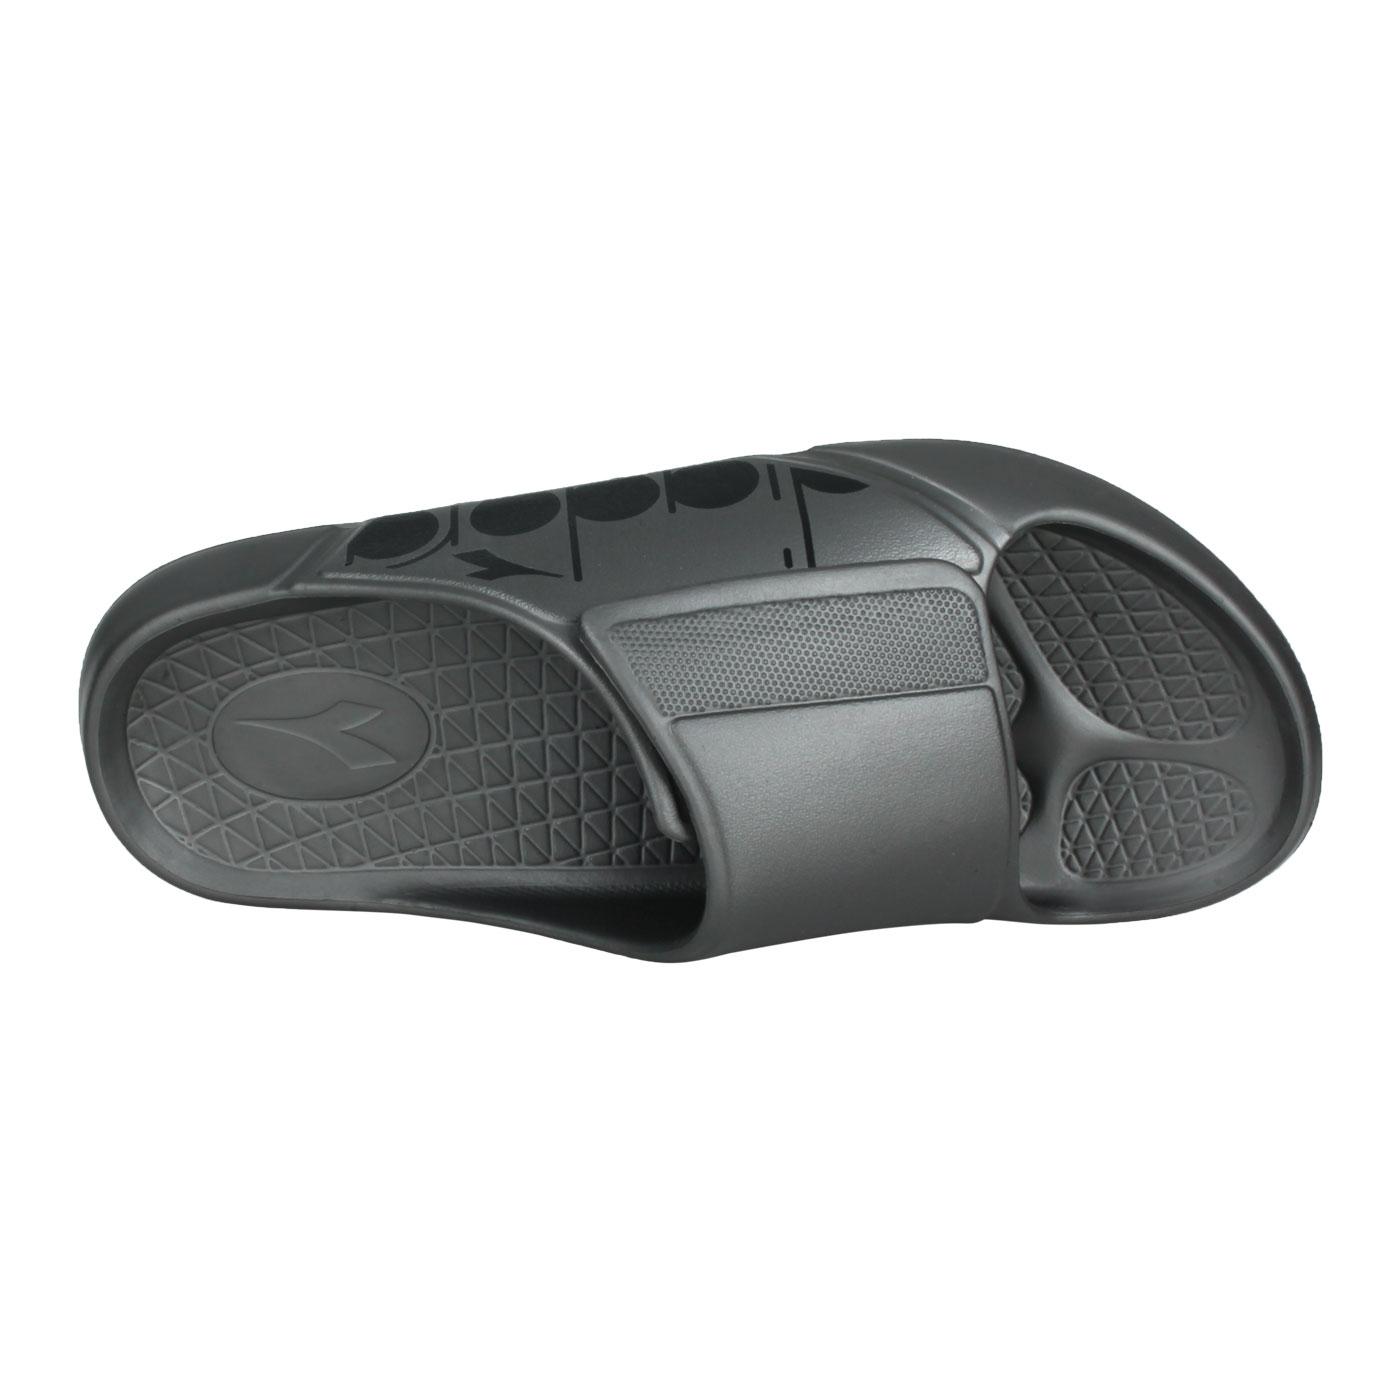 DIADORA 男款MIT拖鞋 DA71221 - 鐵灰黑